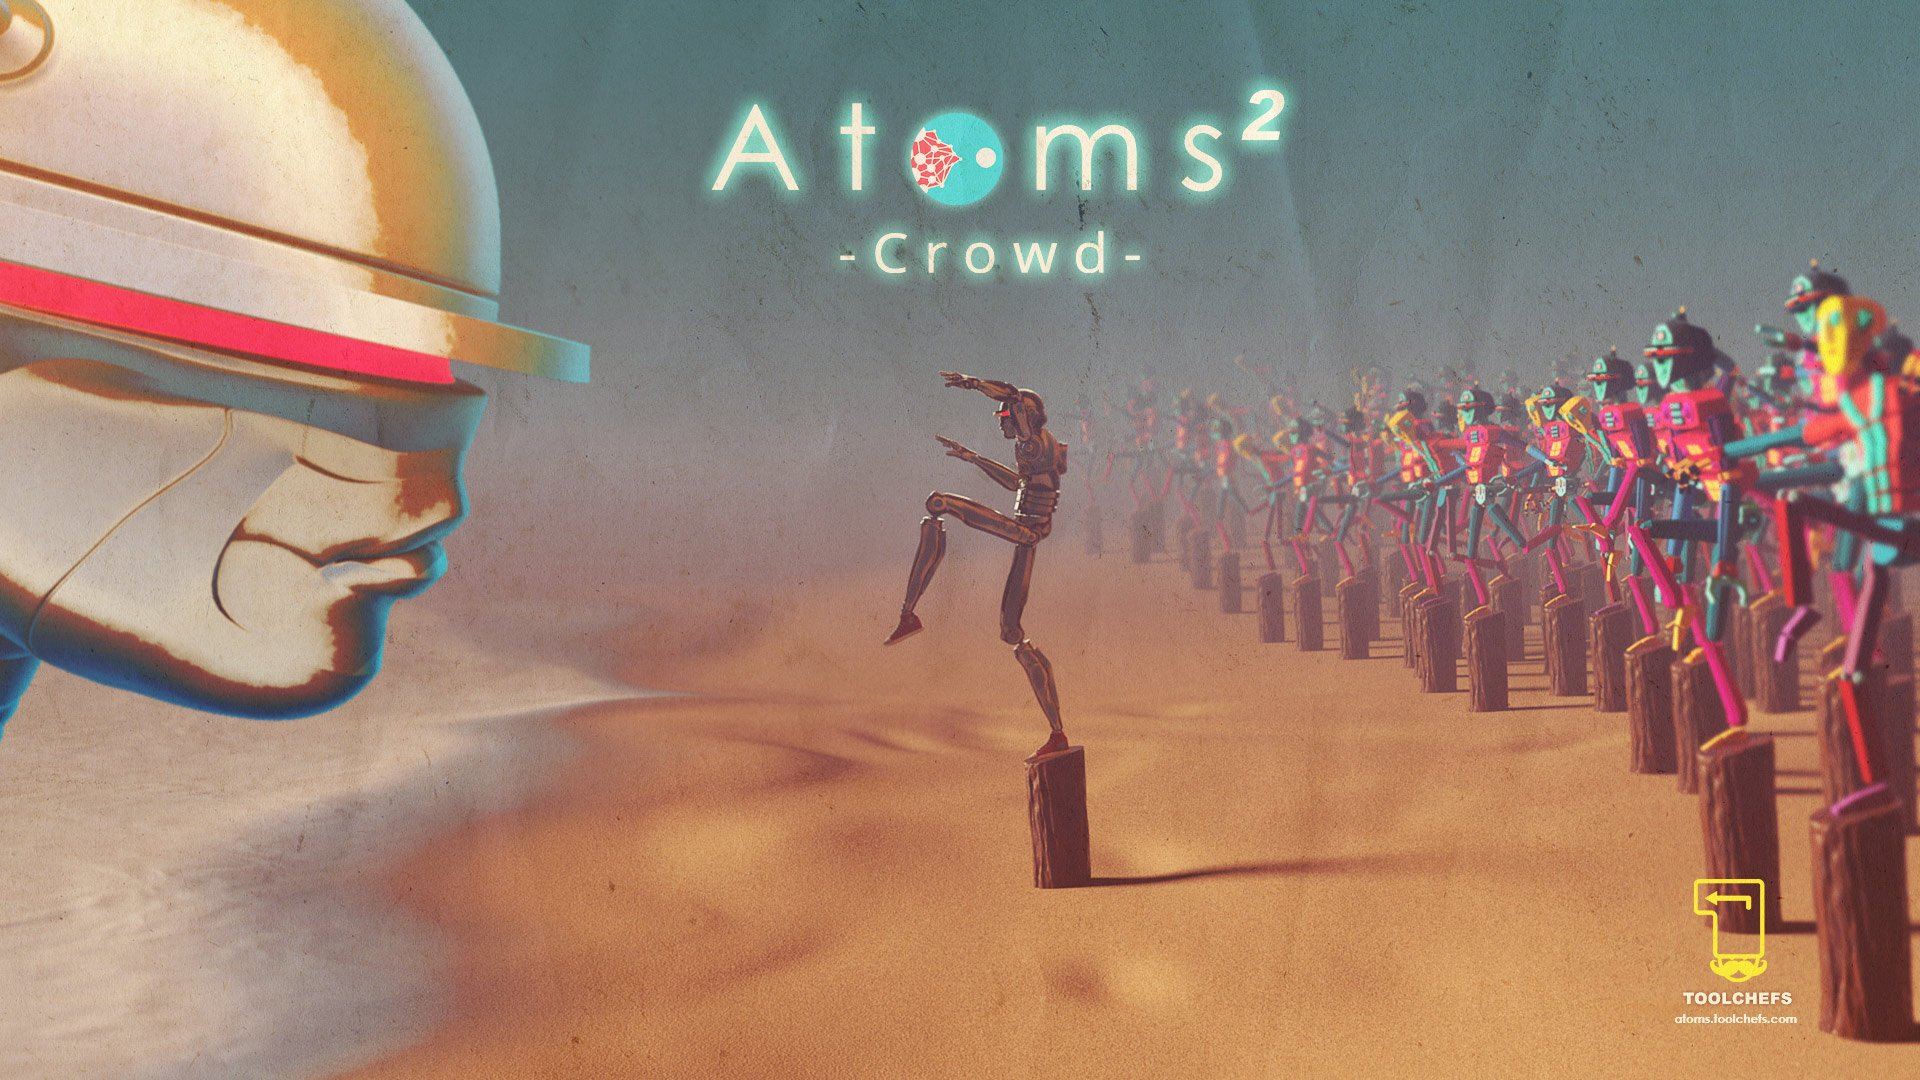 Atoms Crowd 2